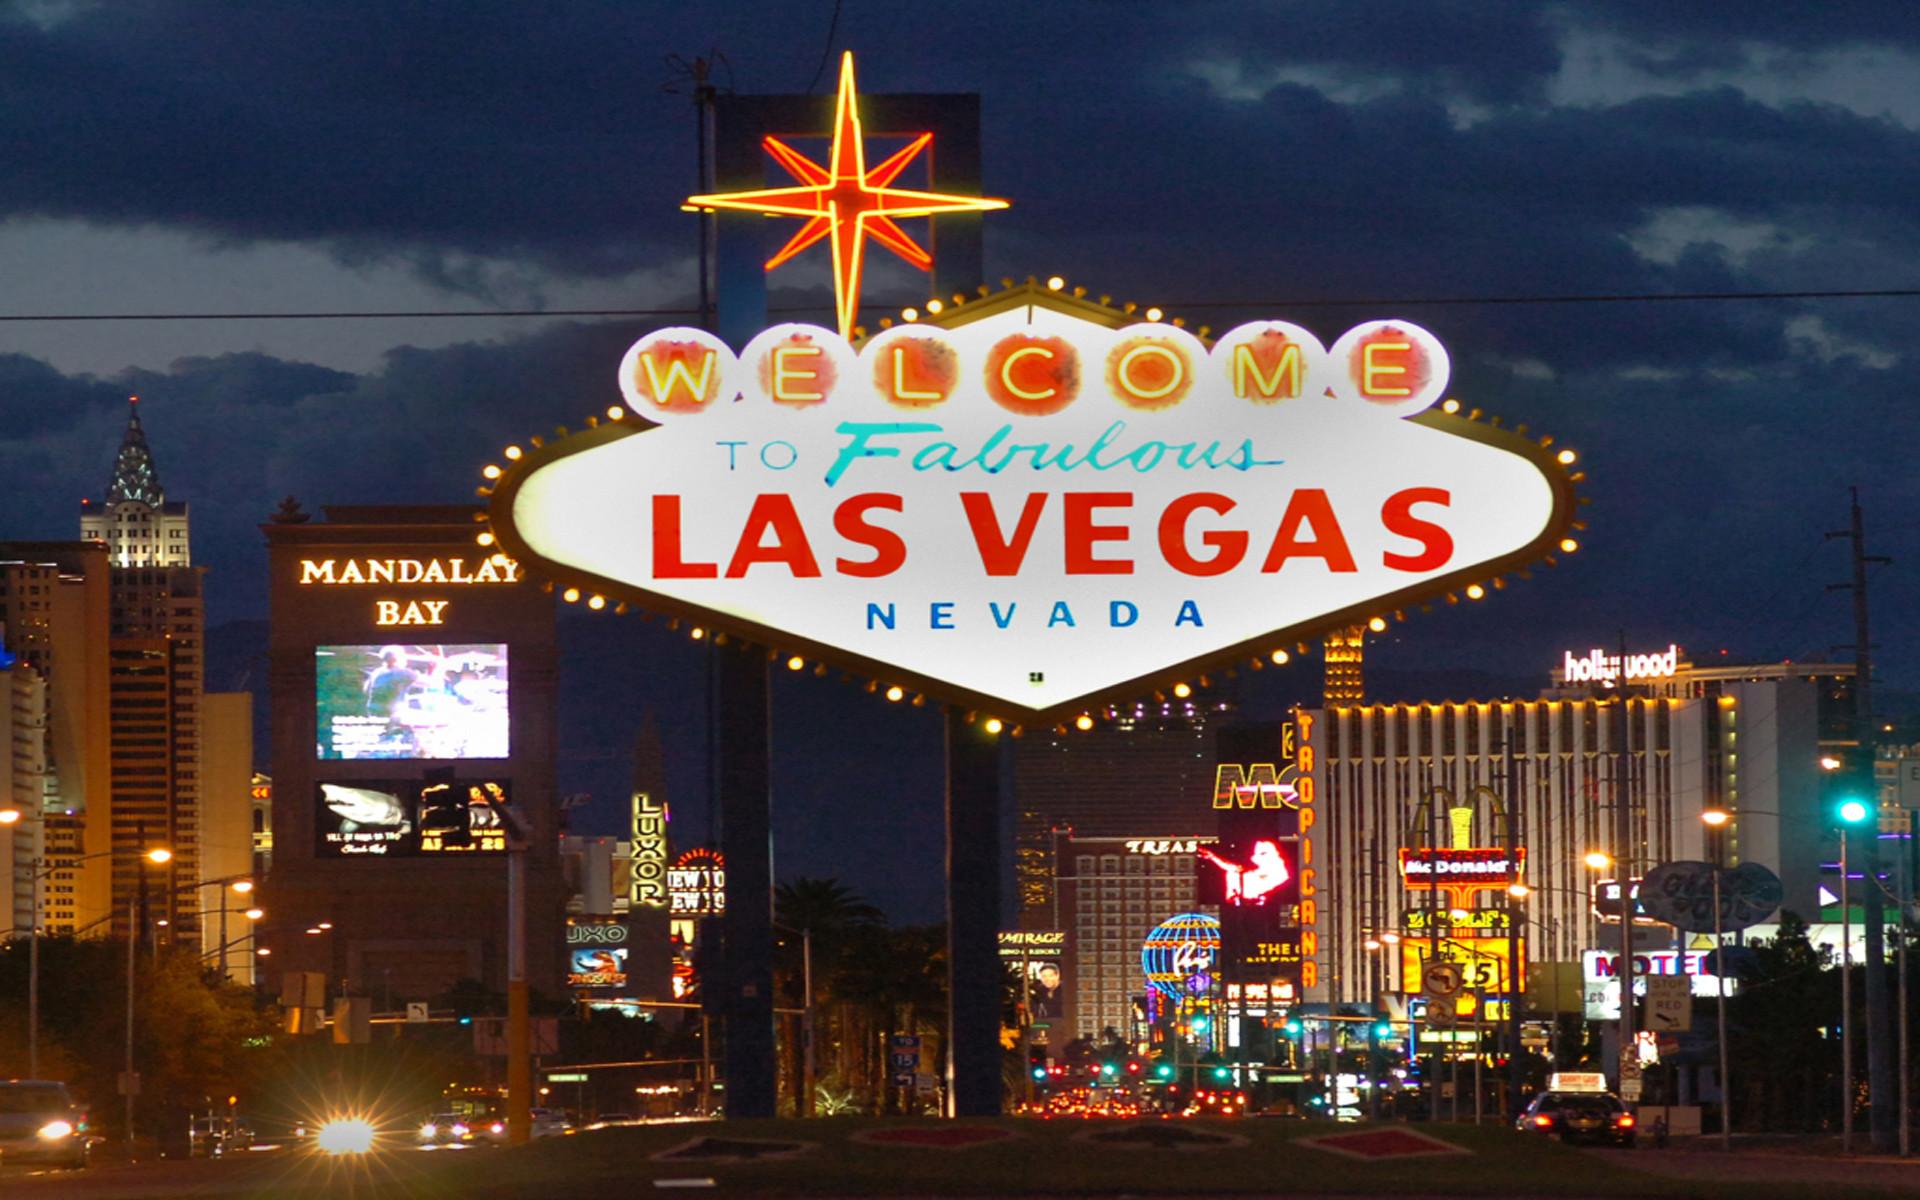 Las Vegas Background Pictures (65+ images)